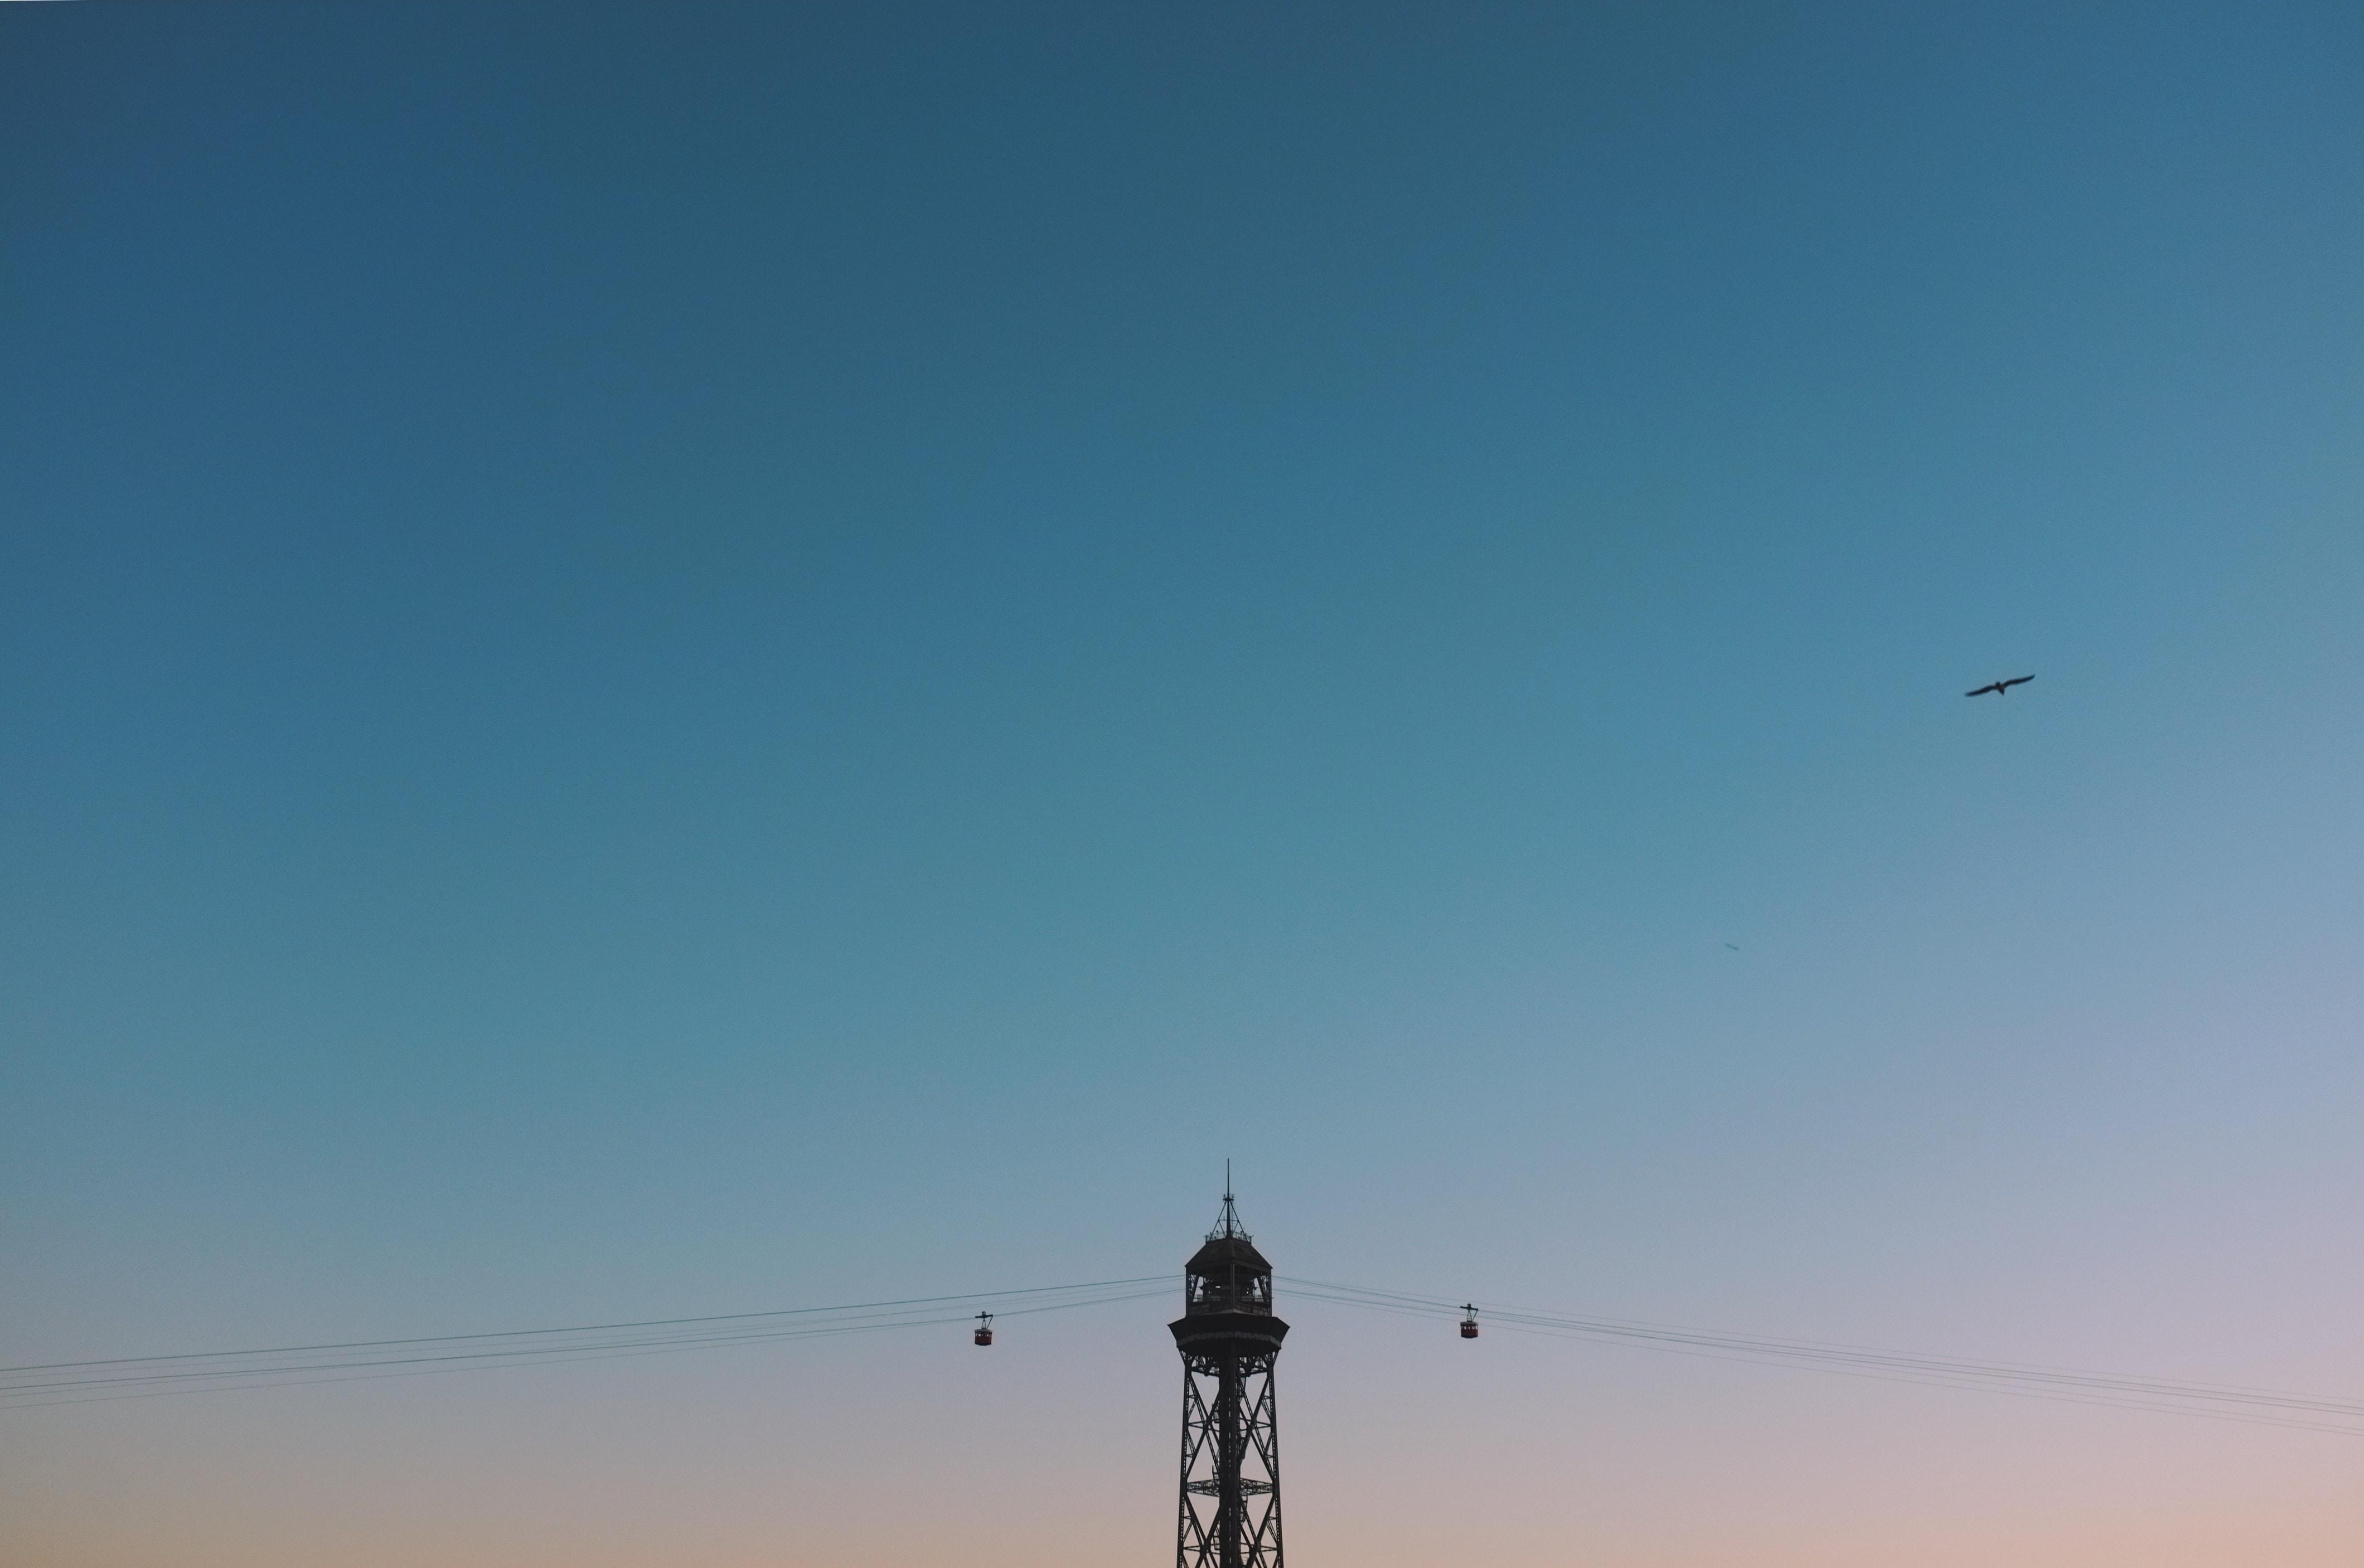 black utility pole landscape photography